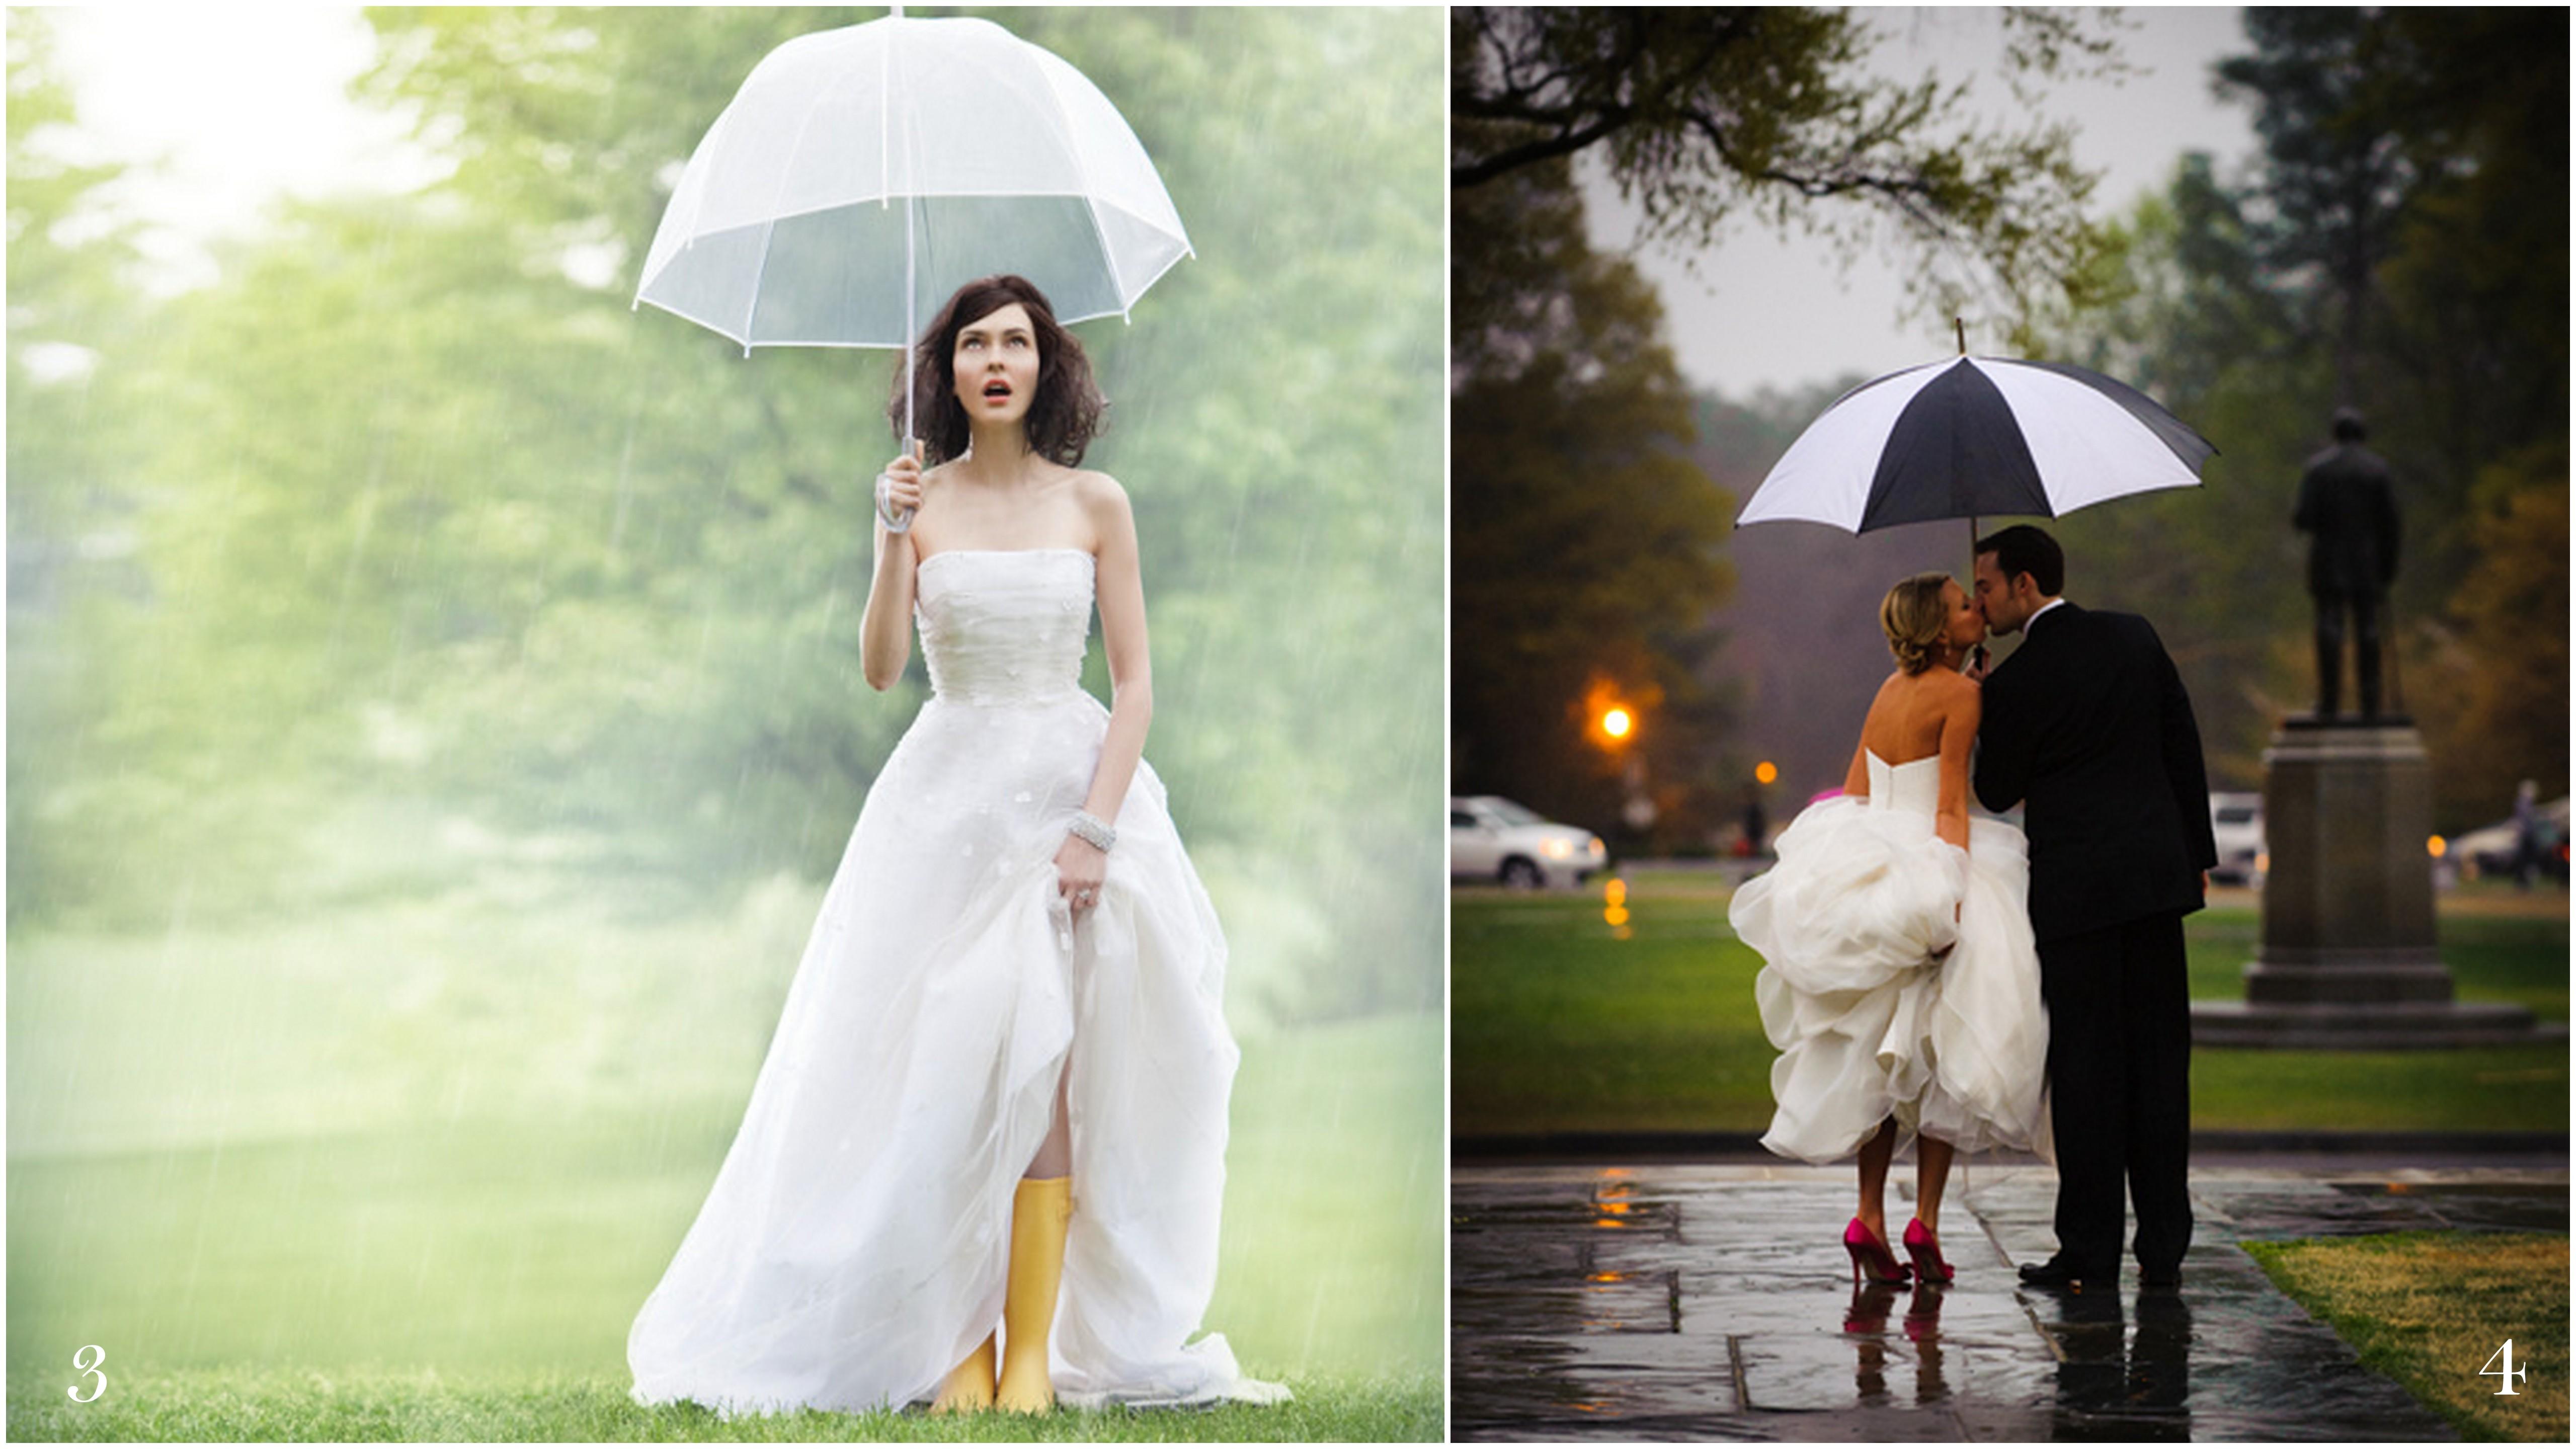 Yellow Rain Boot And Umbrellas